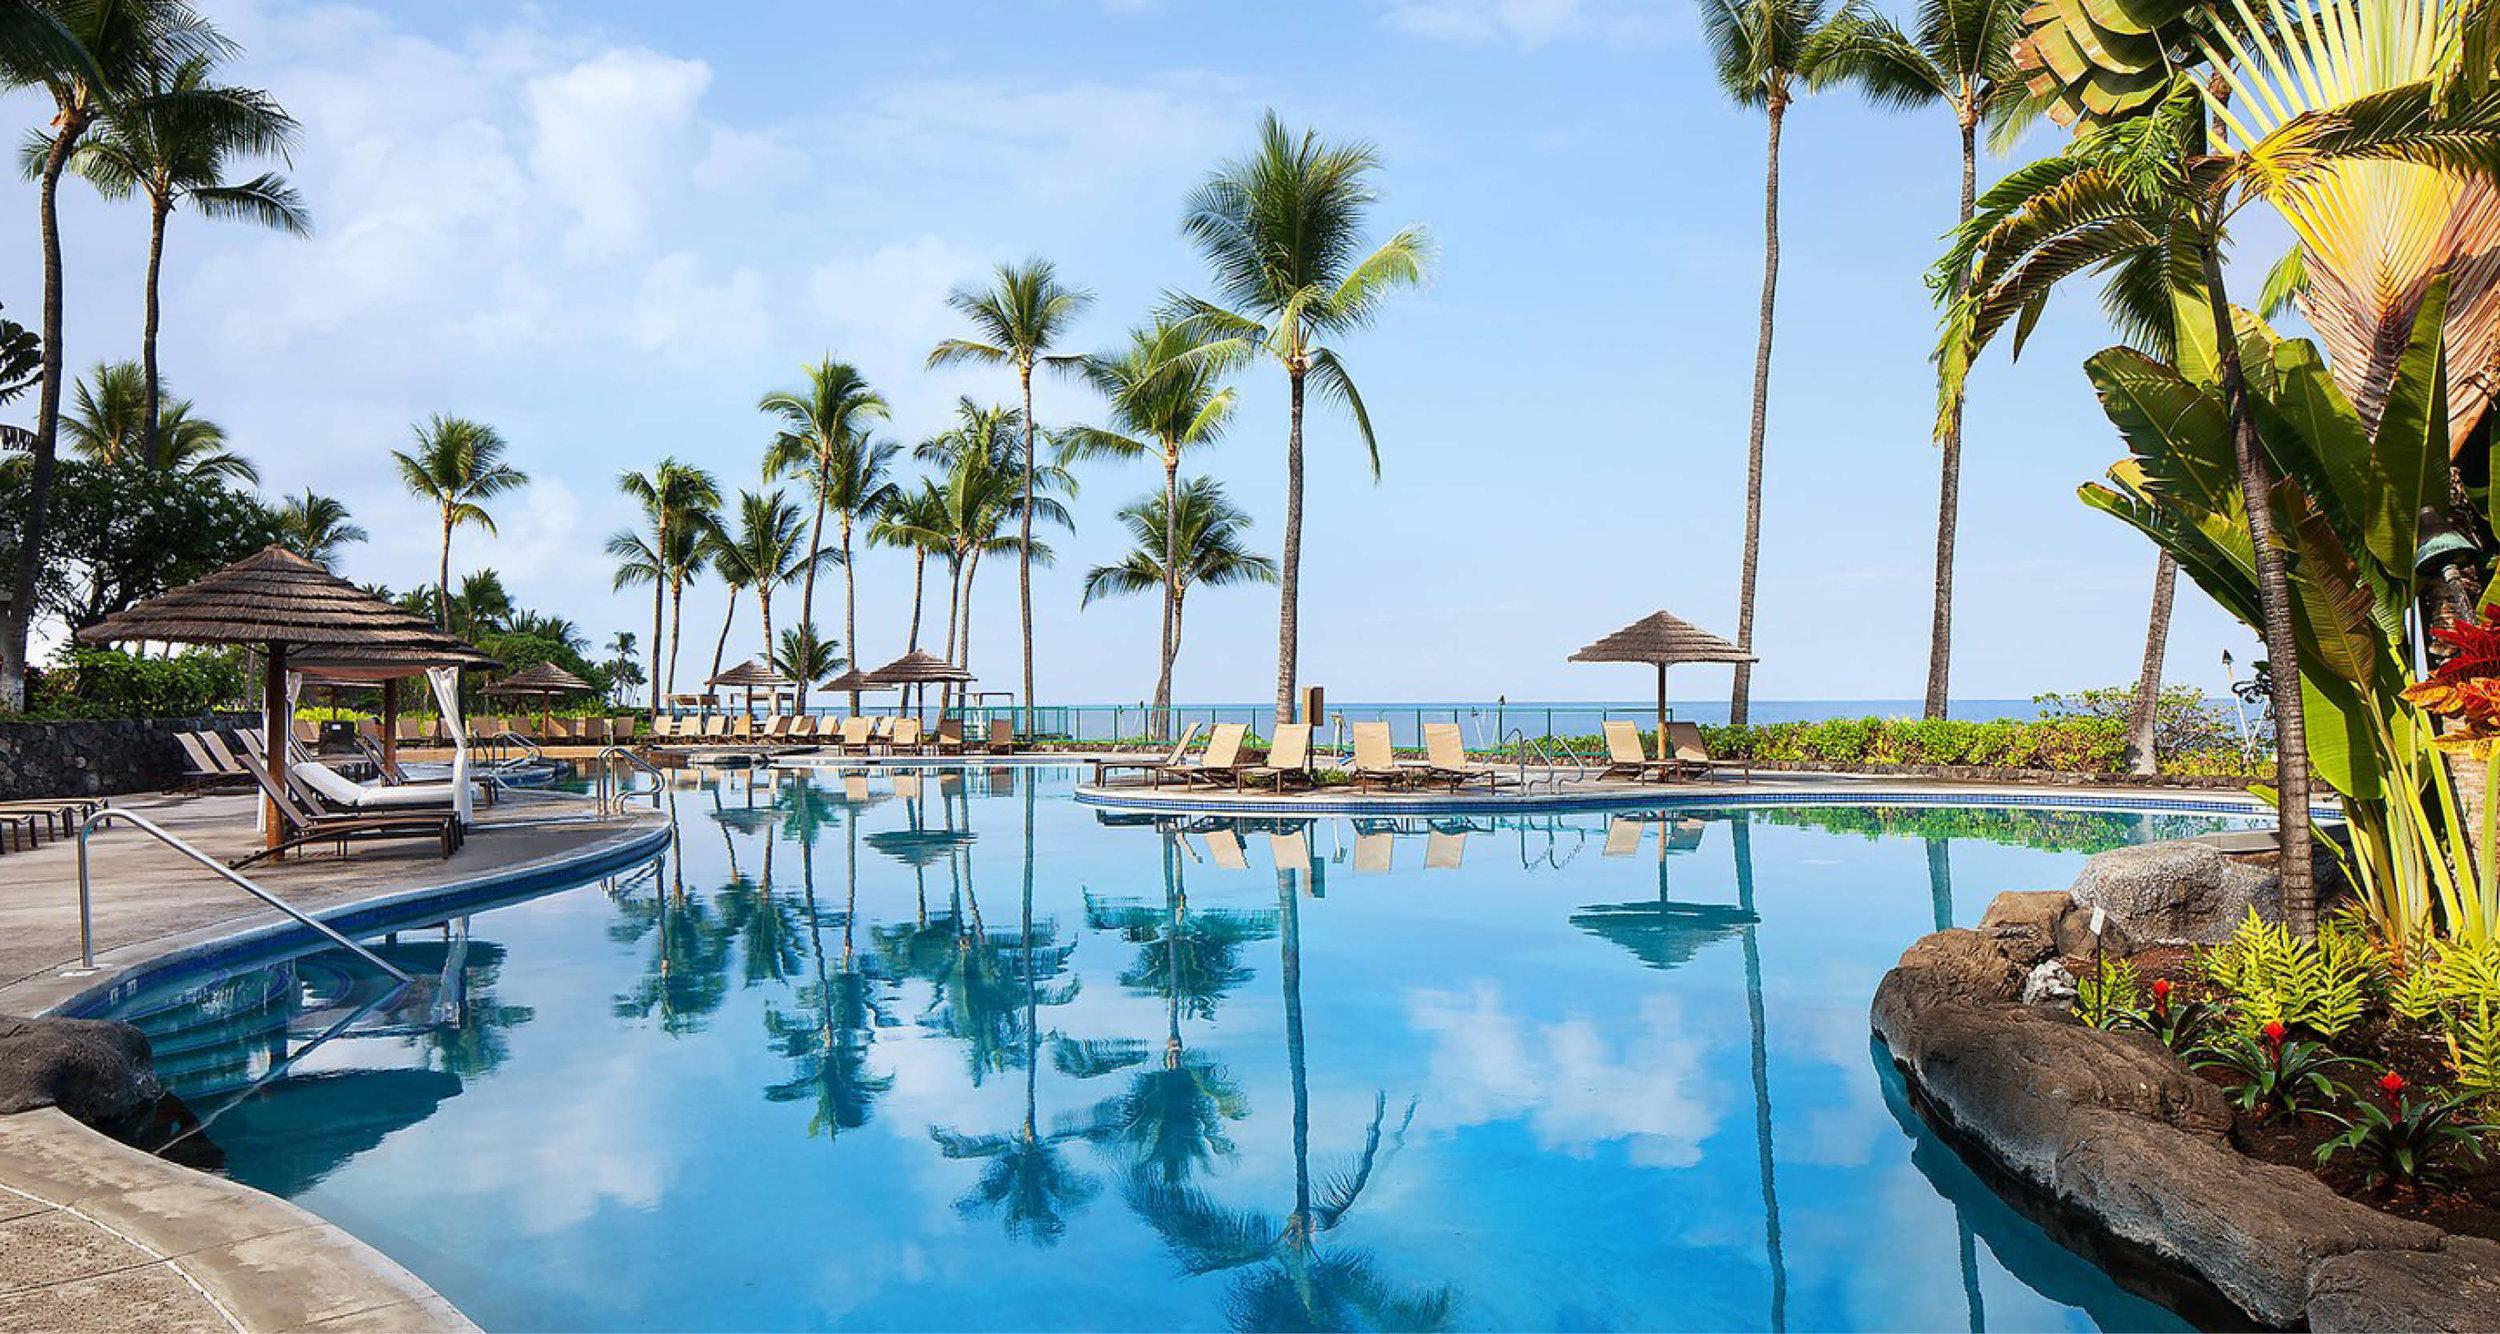 Dream-Maker-Travel-Accom-Hawaii-Sheraton-Pool.jpg